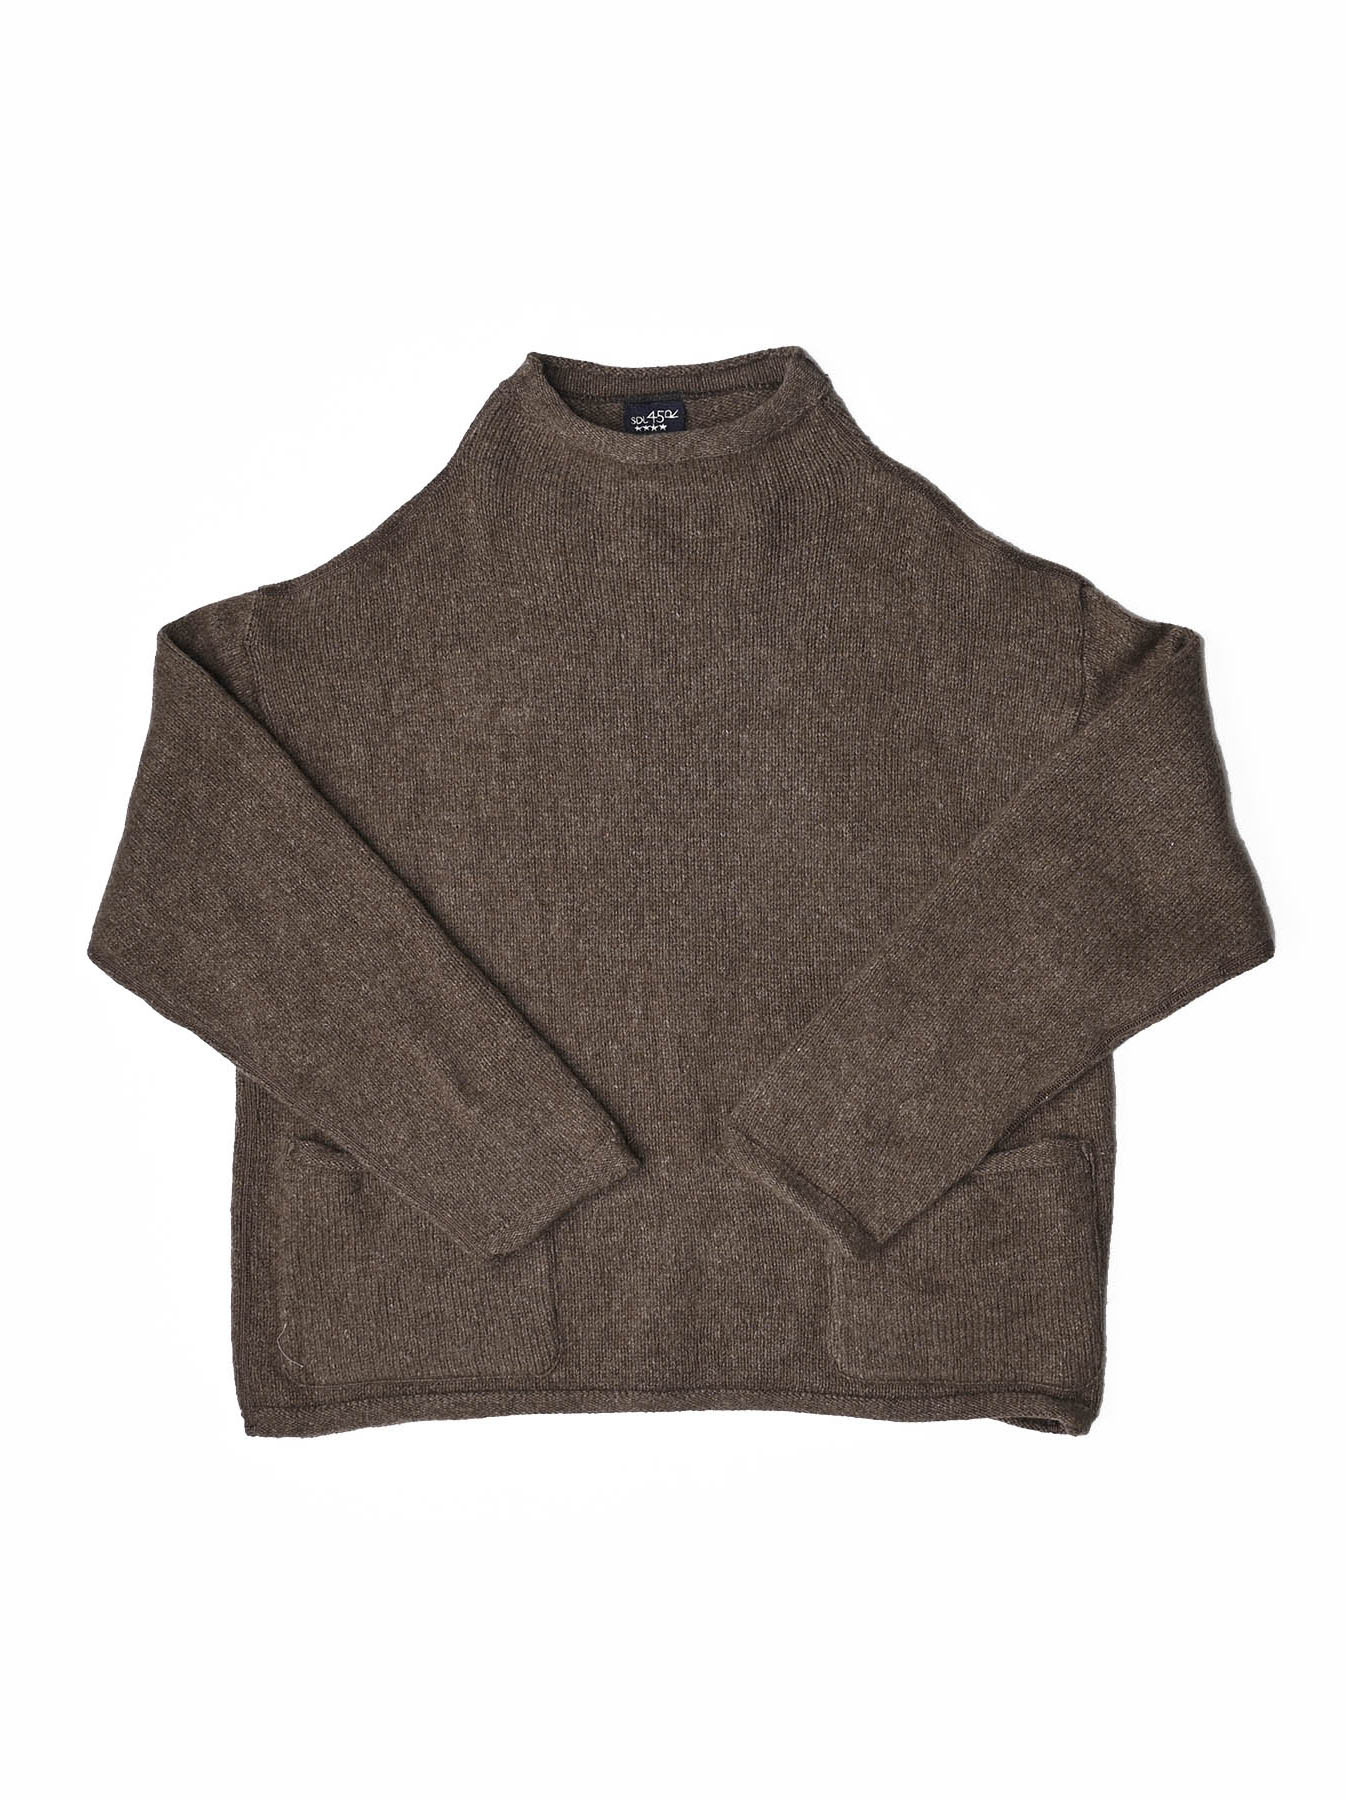 45 Star Cashmere Umahiko Sweater-1